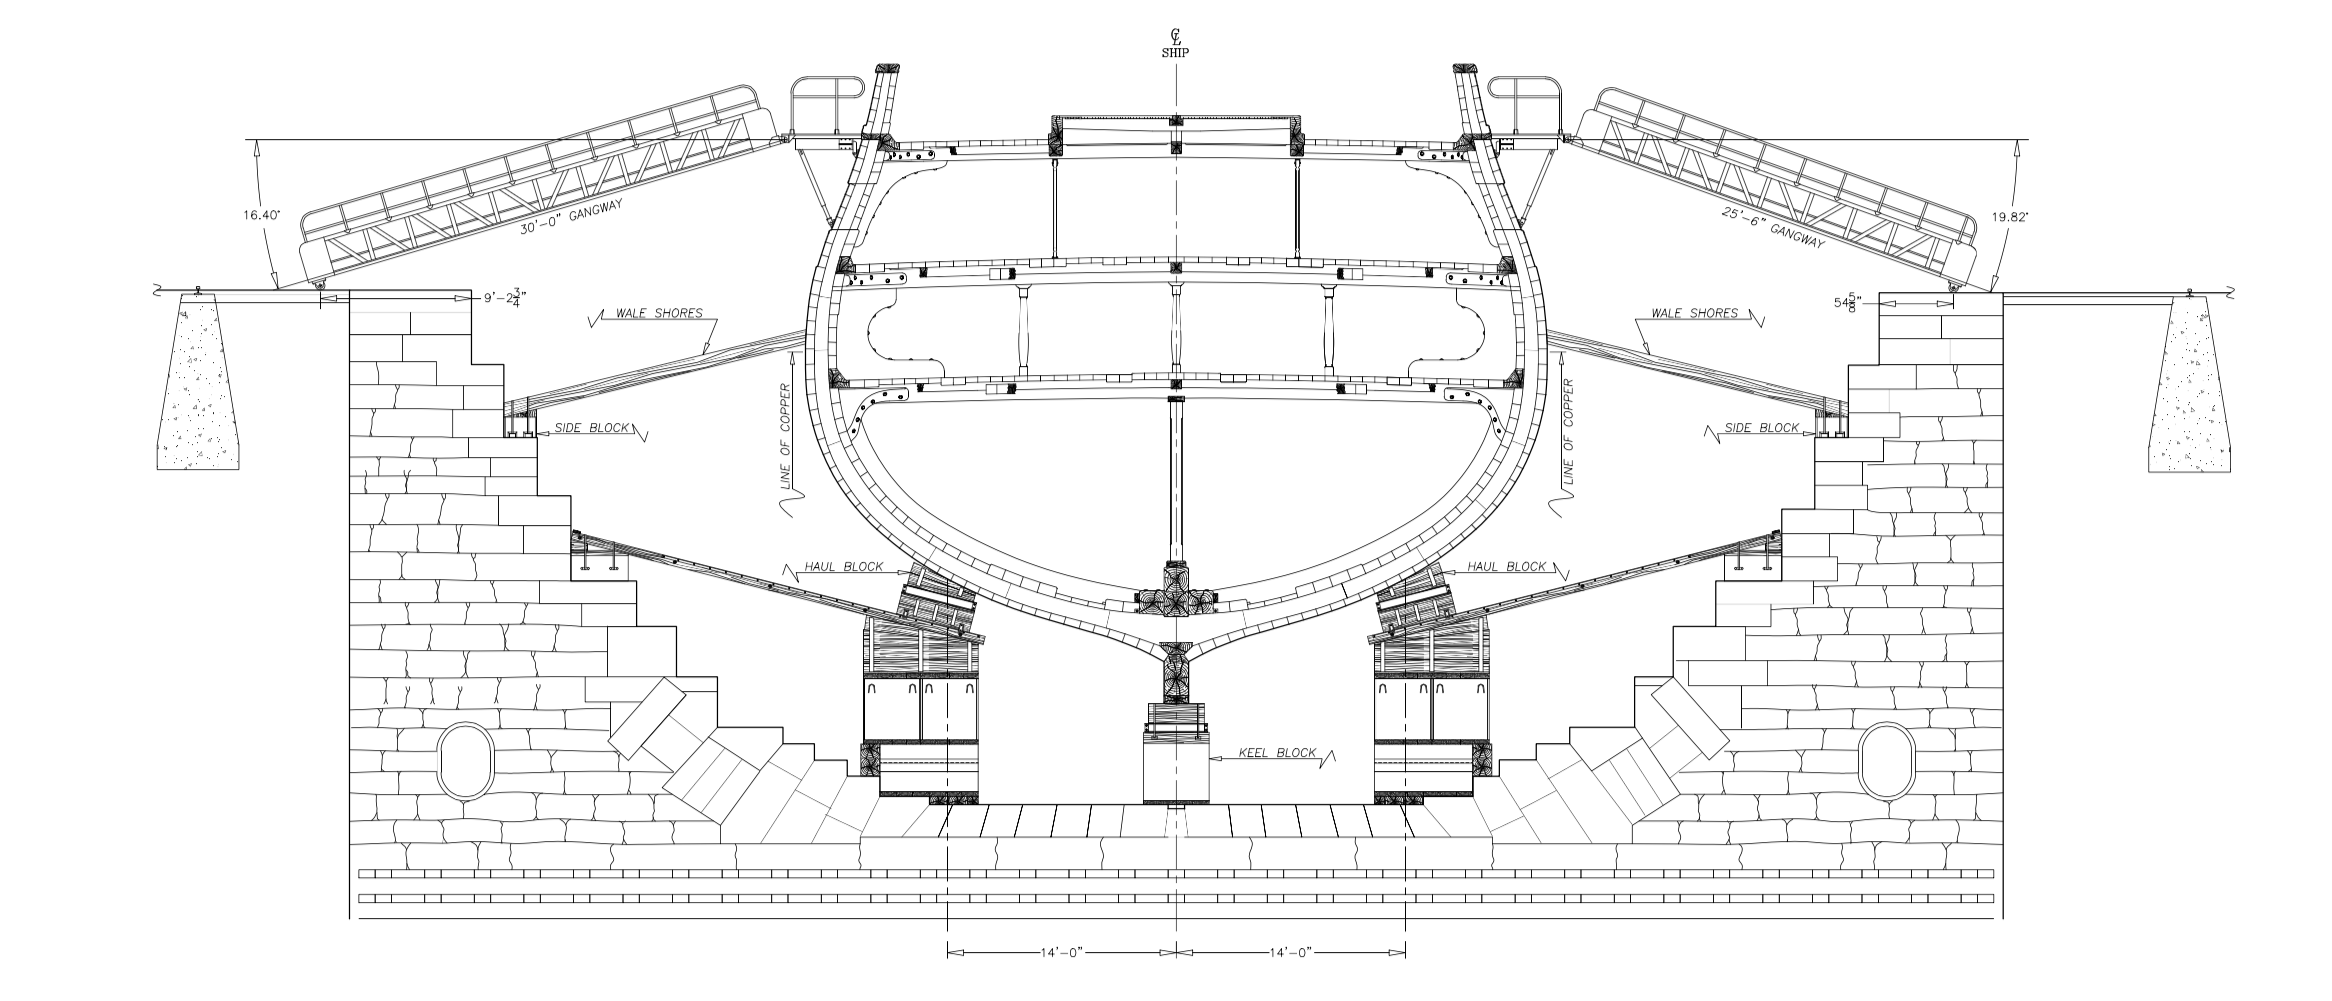 hight resolution of dry dock diagram wiring diagram blog dry well diagram charlestown navy yard dock lines dry dock